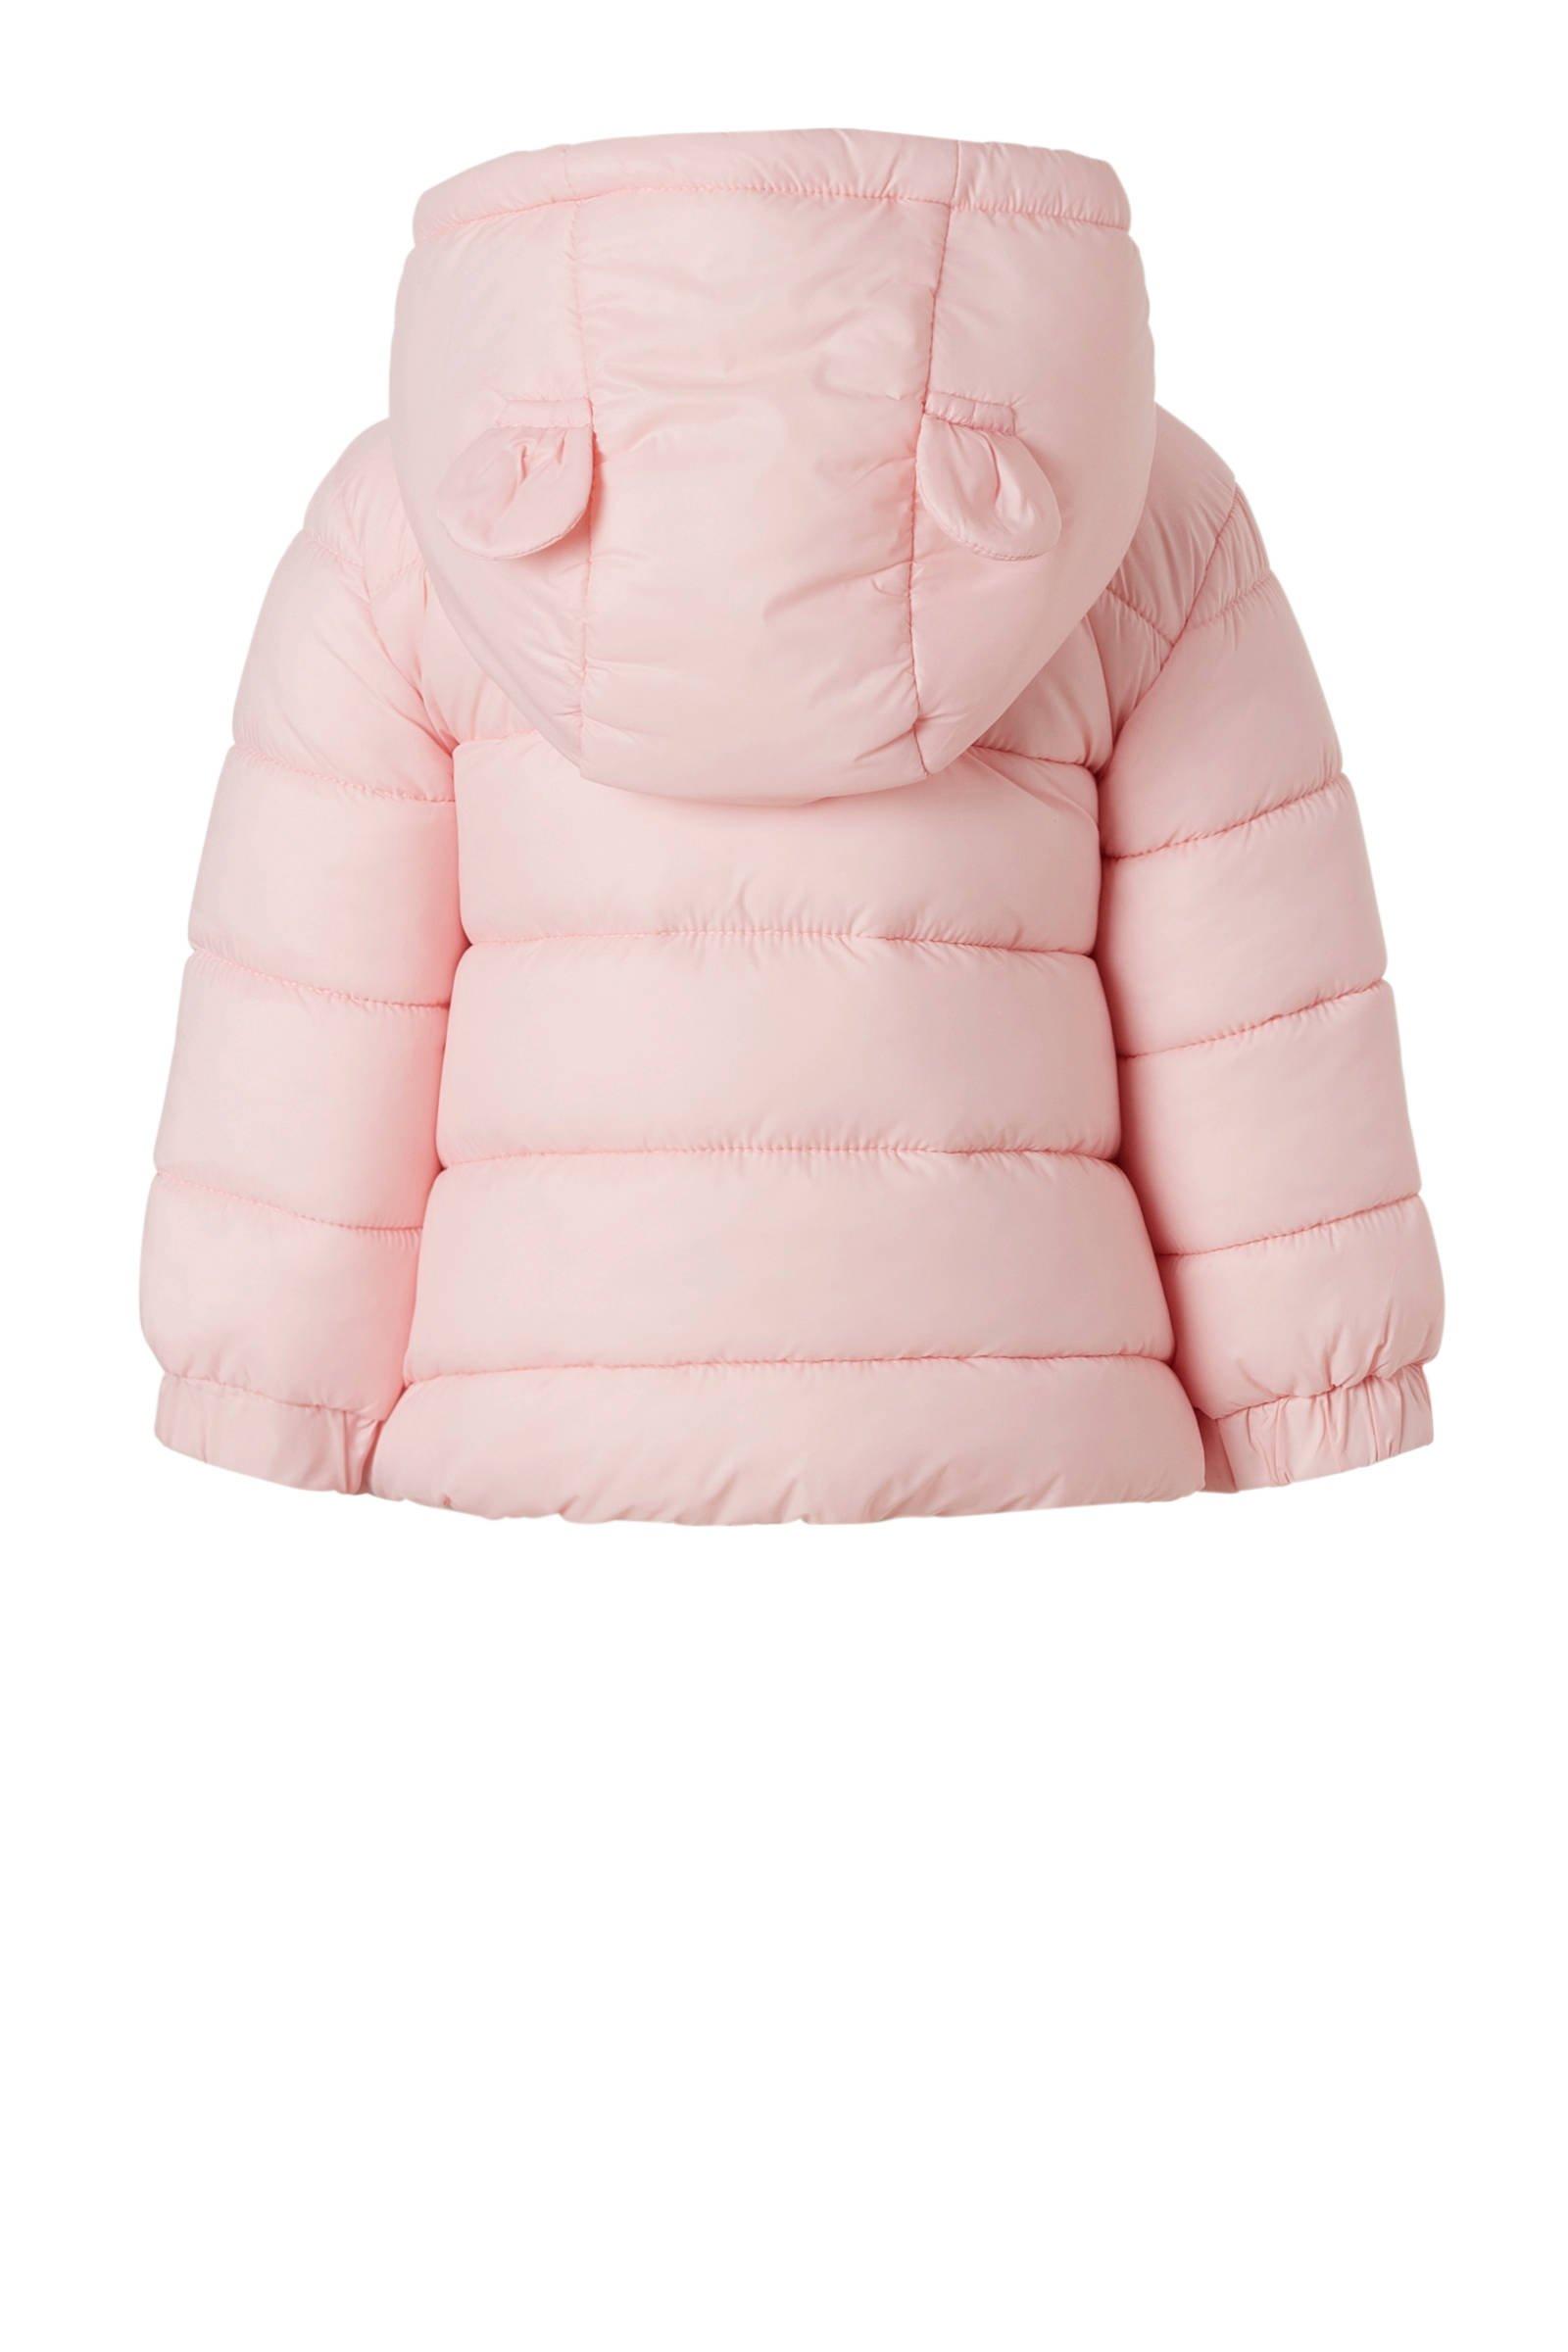 Babykleding Winterjas.C A Baby Club Winterjas Lichtroze Wehkamp